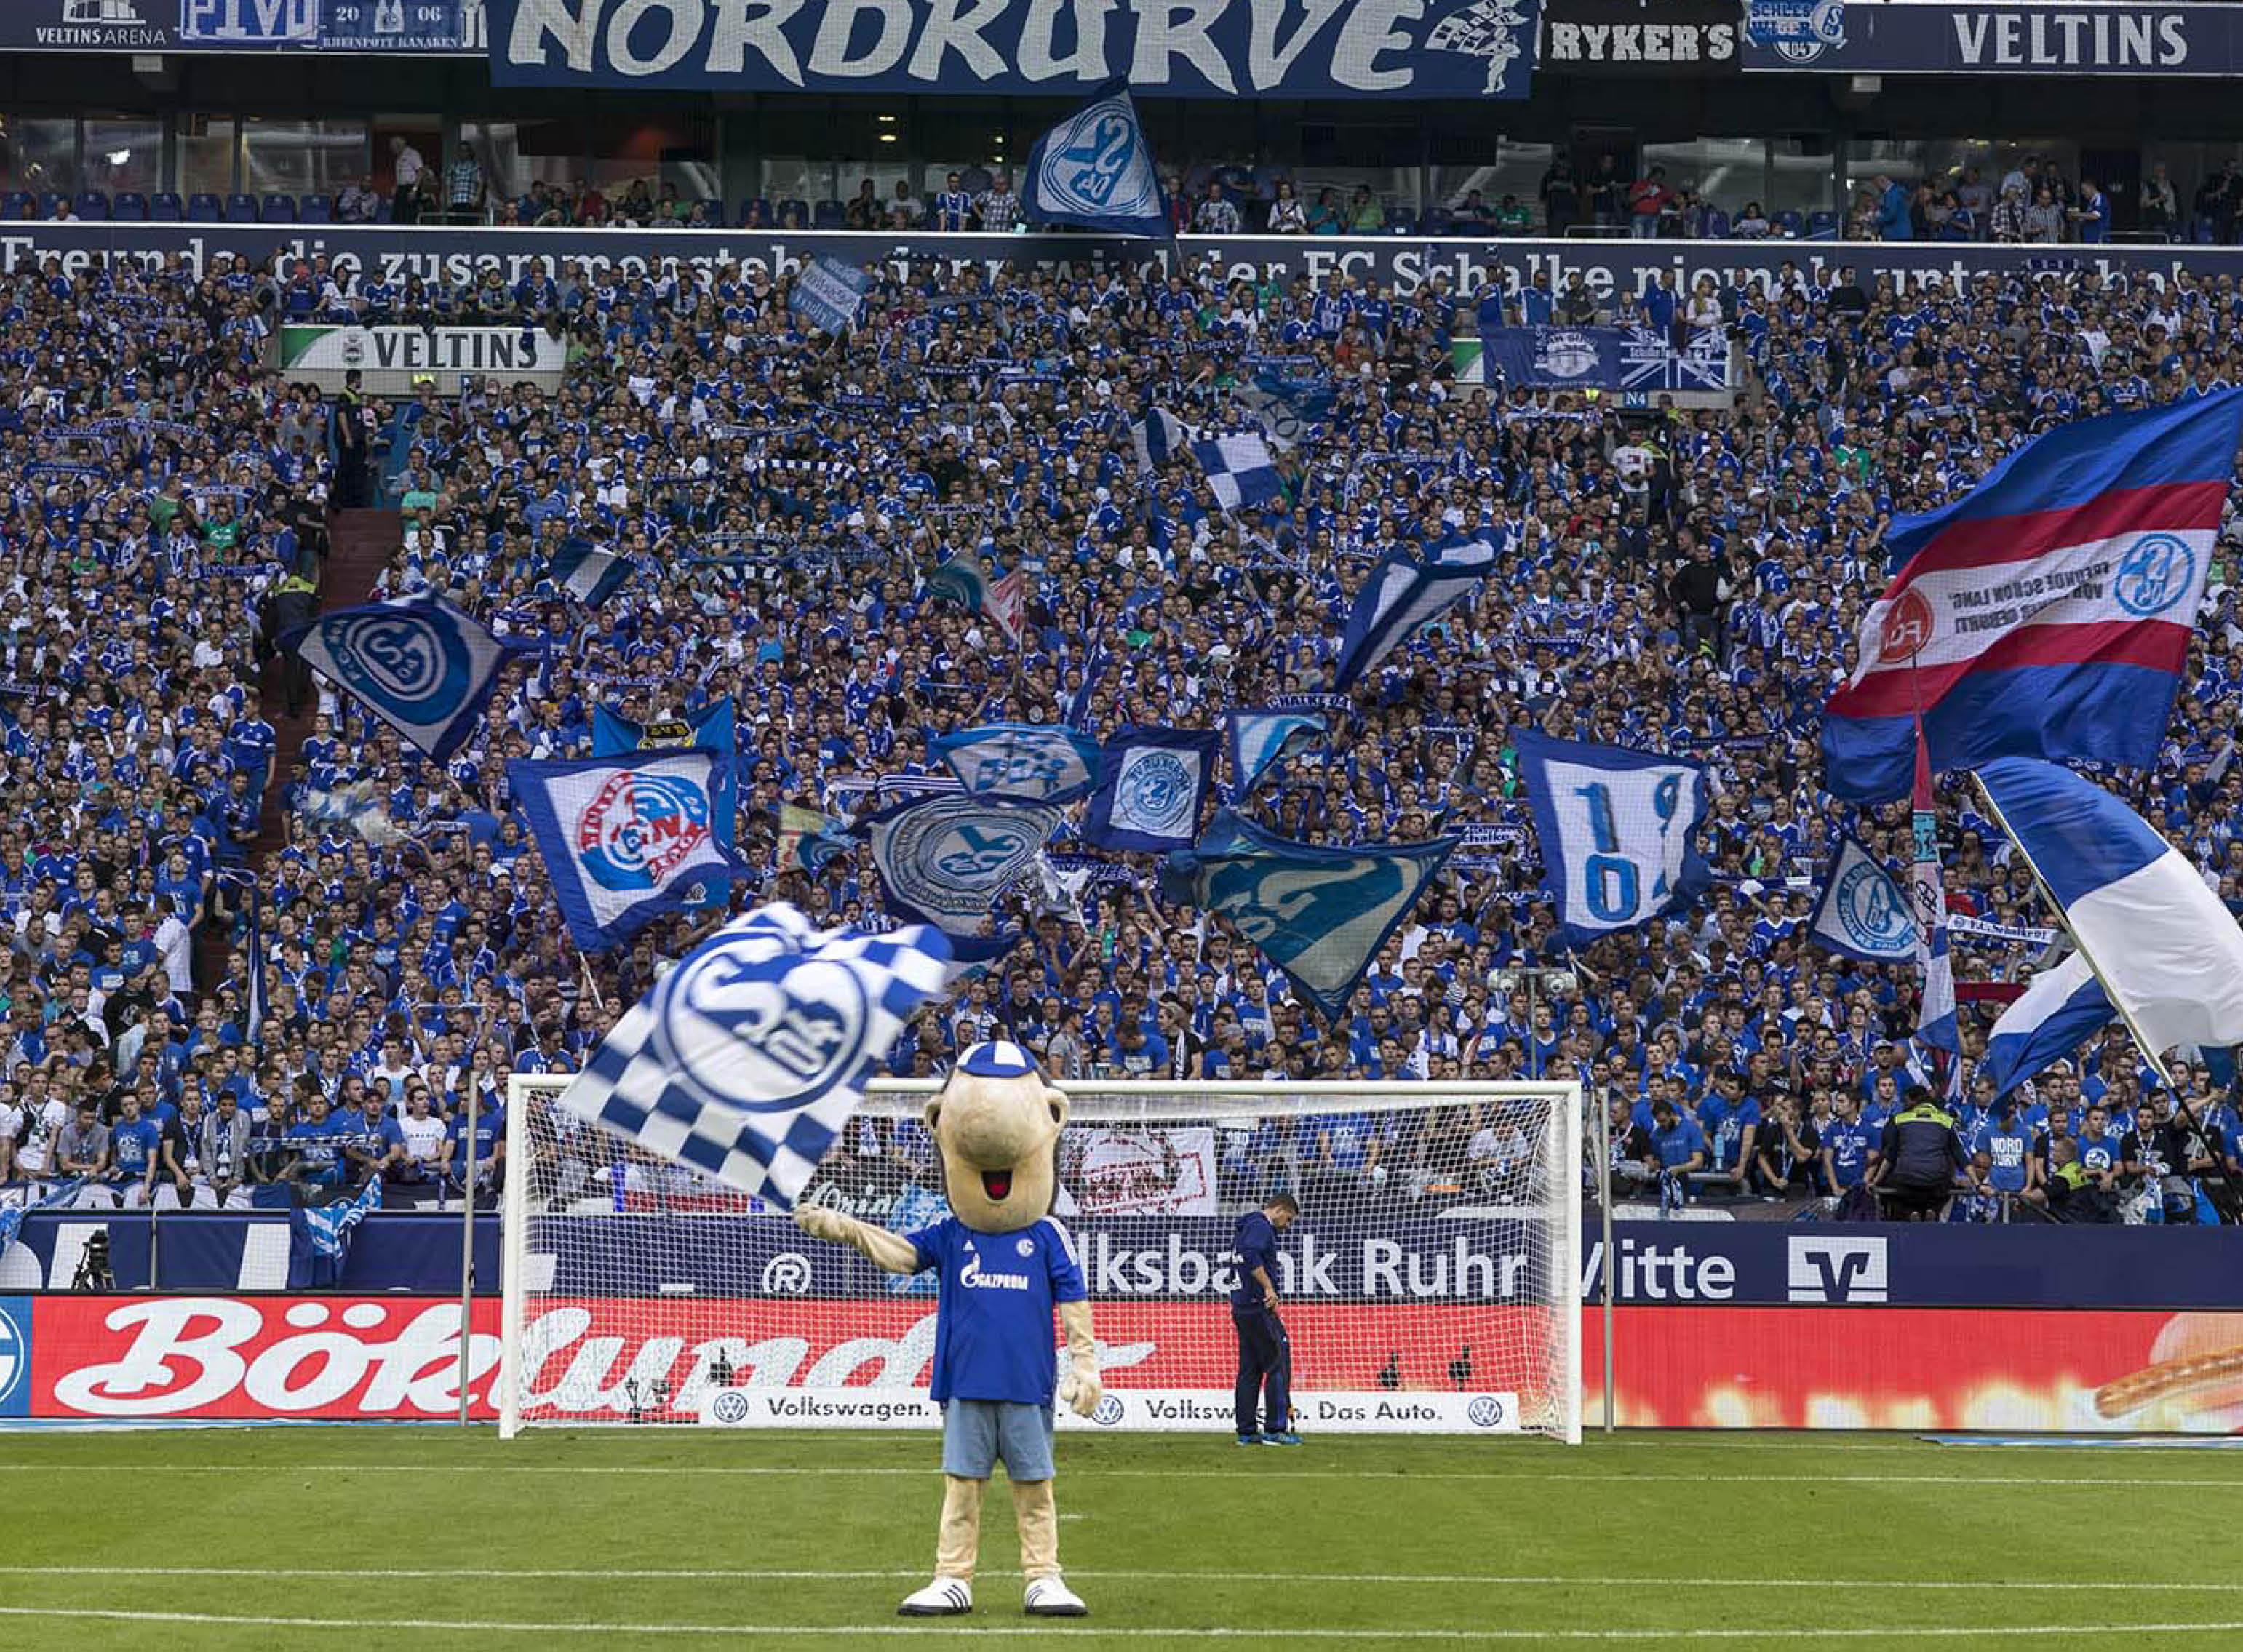 Schalke04 Erwin